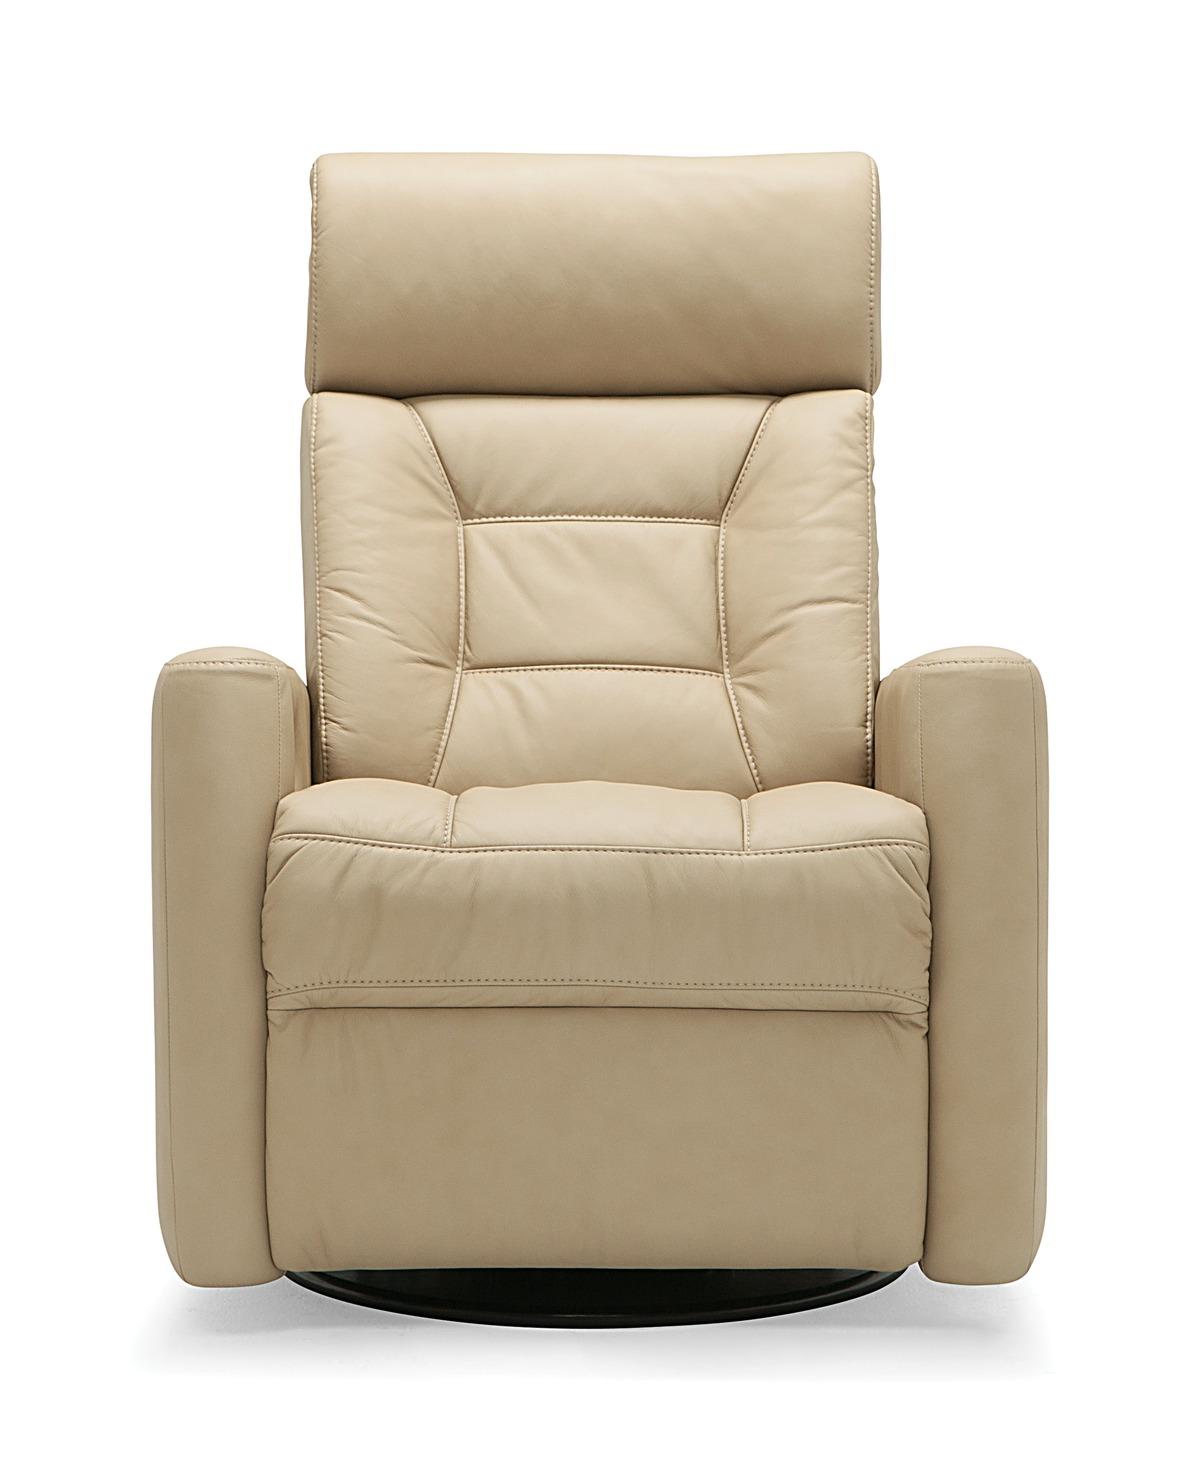 Palliser Furniture Baltic Ii Power Swivel Glider Recliner 43411 38